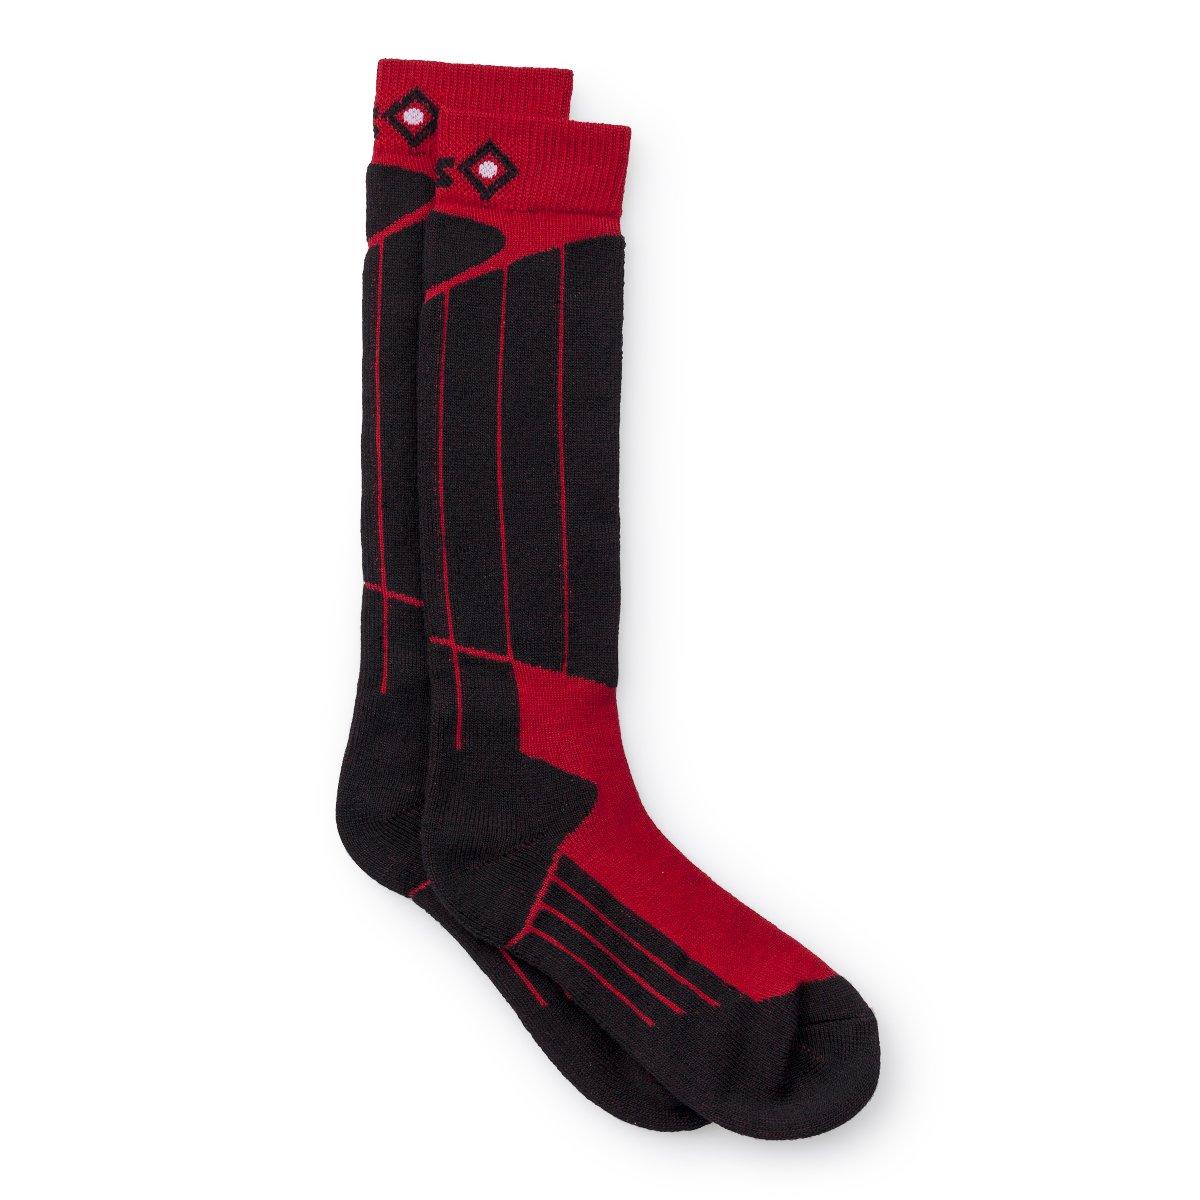 Izas Fontan Calcetines Unisex Color Negro//Rojo